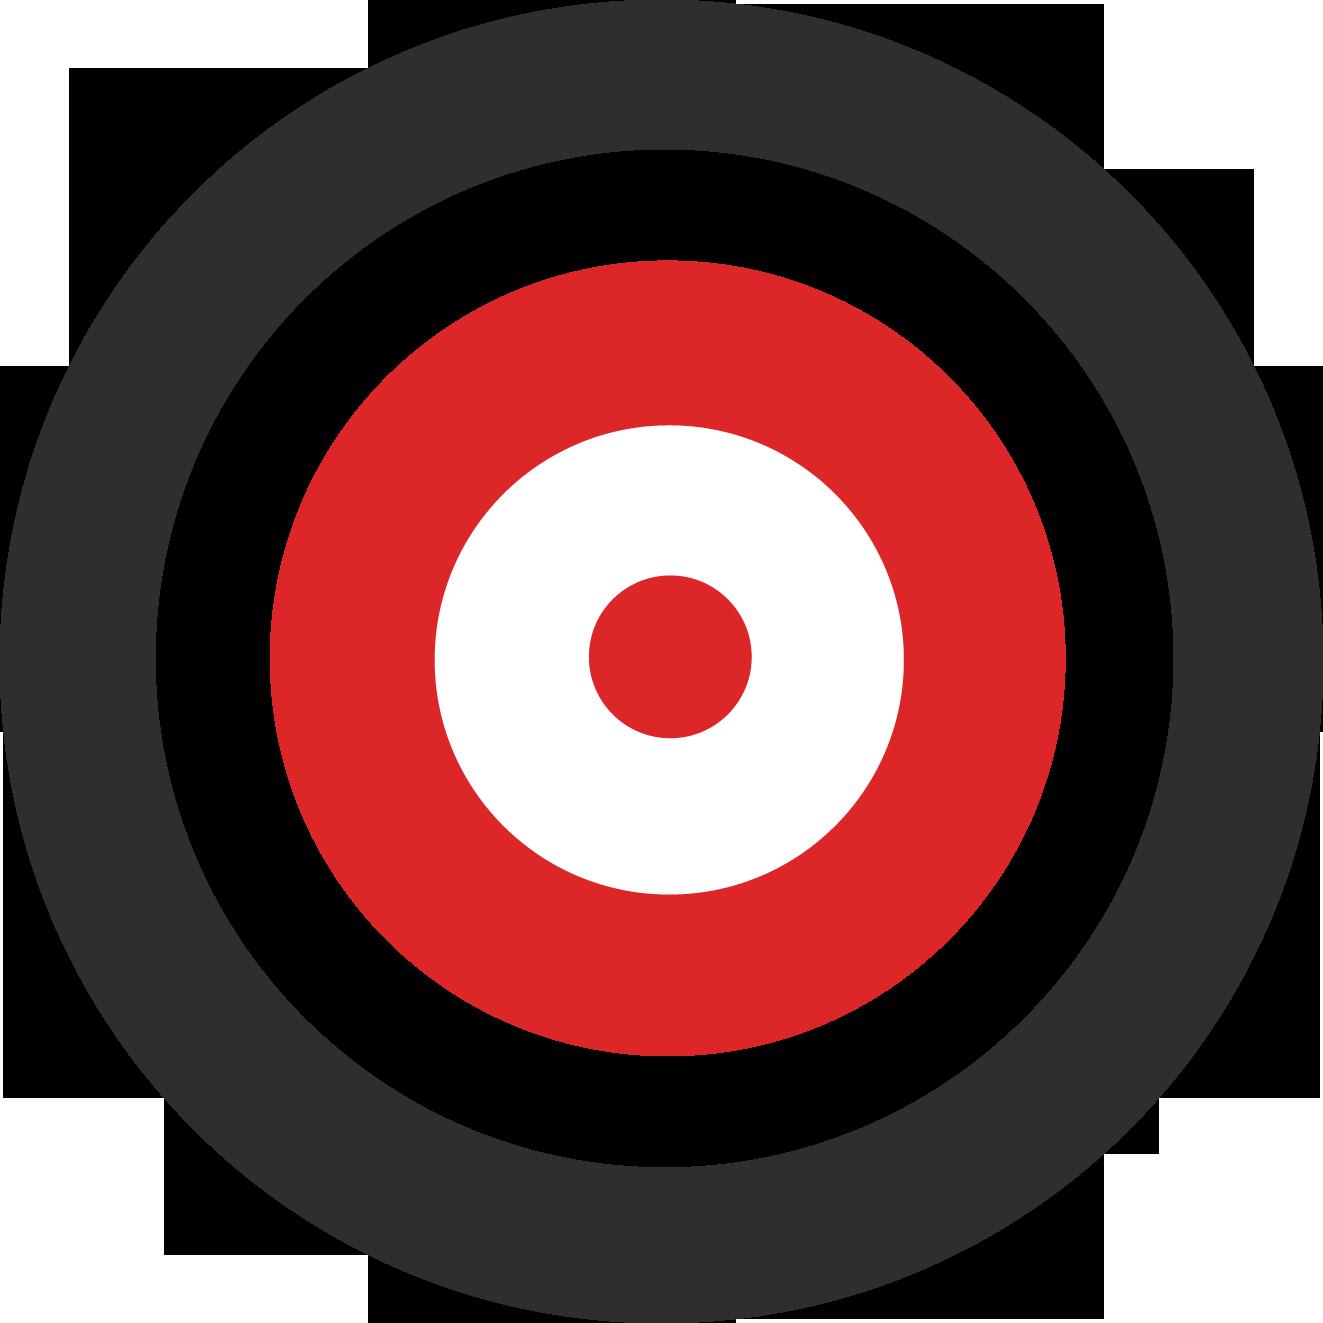 Target Symbol Image #4534 - Target, Transparent background PNG HD thumbnail